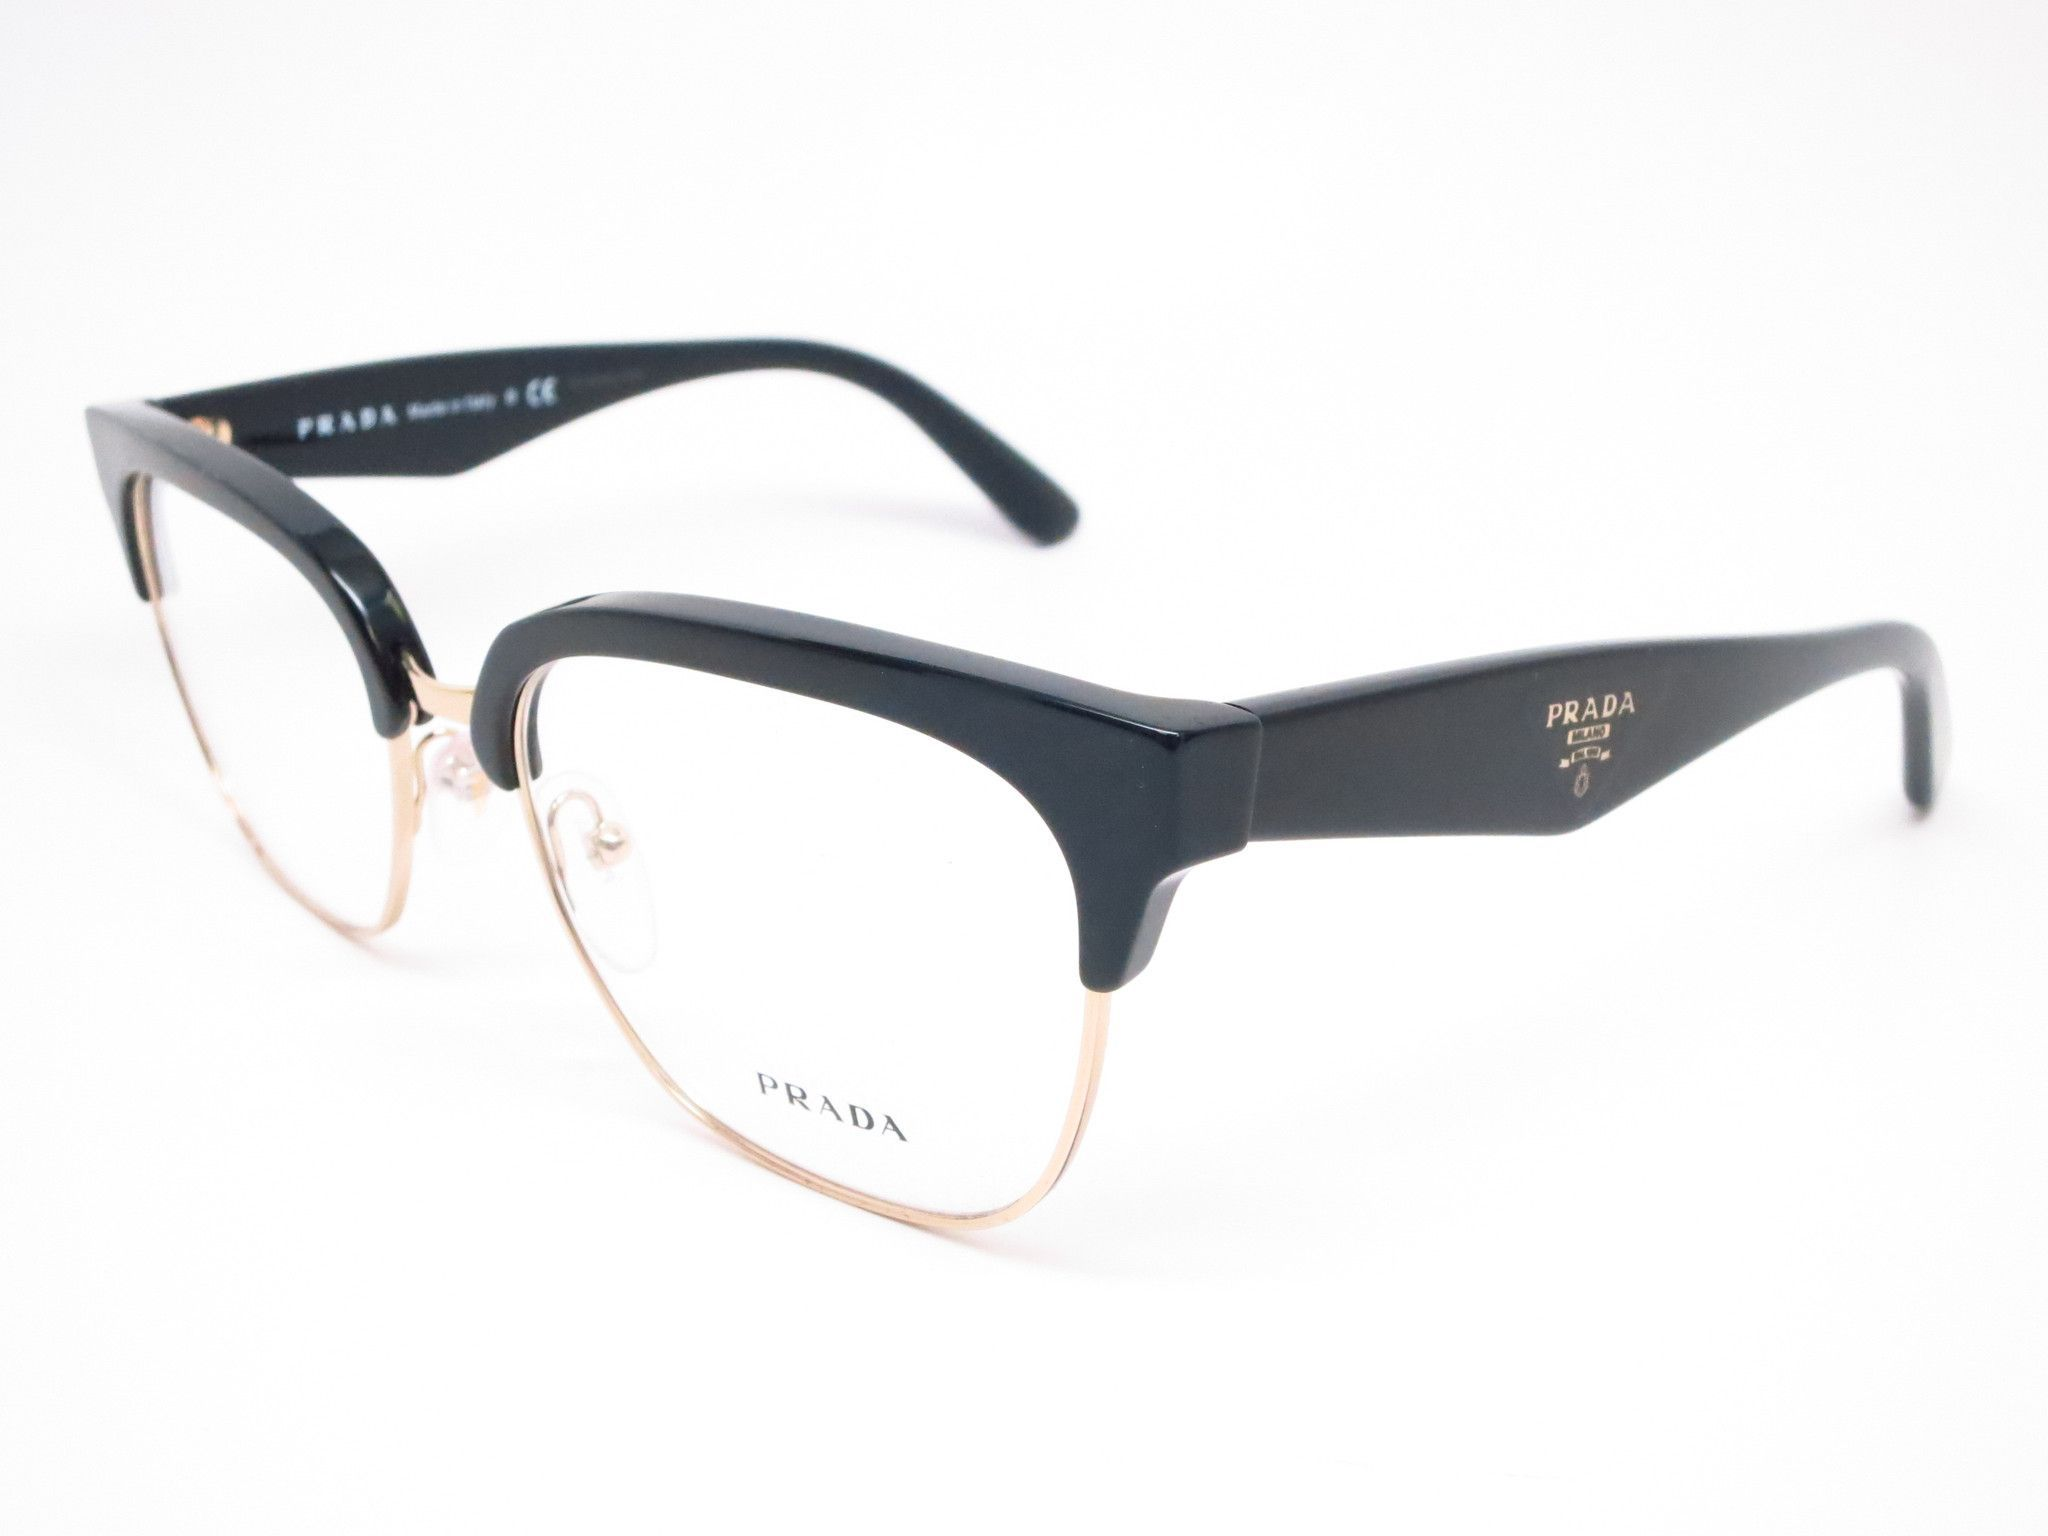 d315b603a8 Prada PR22OV Eyeglasses